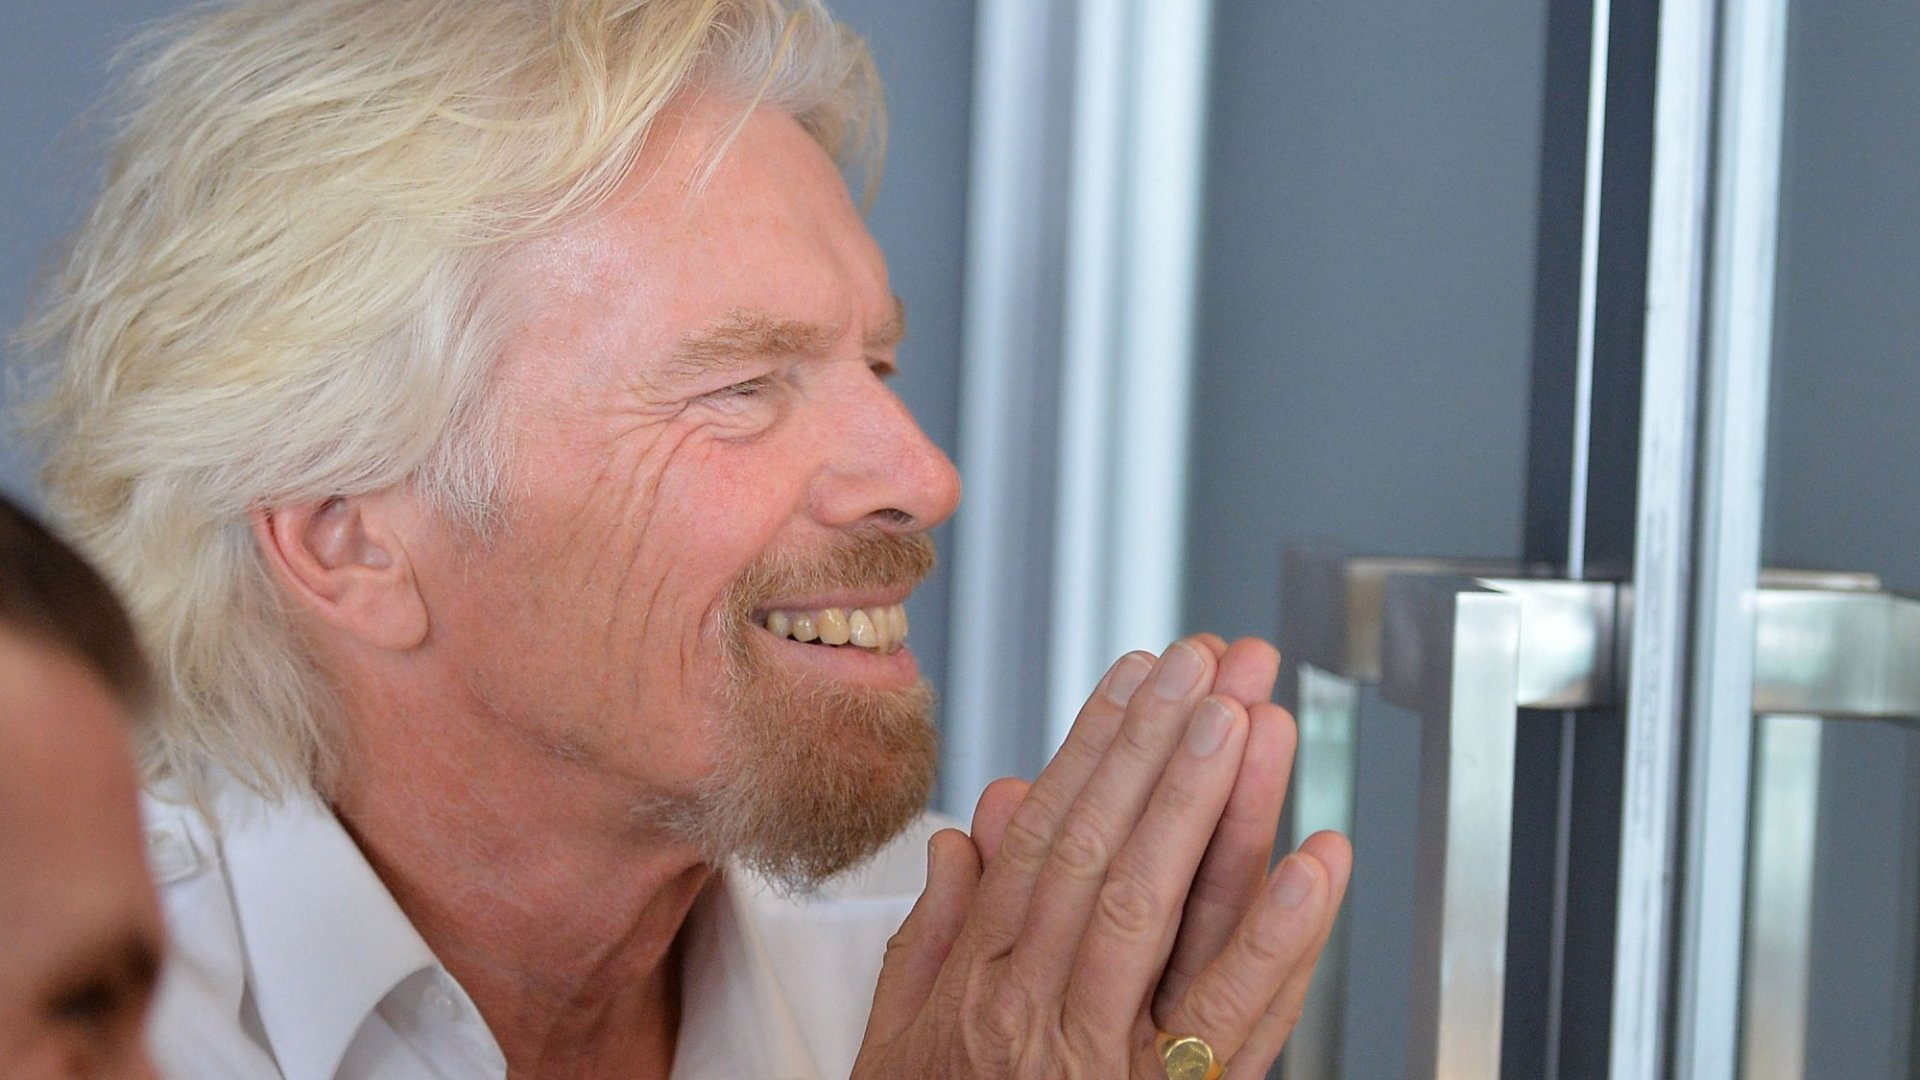 11 Life Hacks to Make You Happier at Work